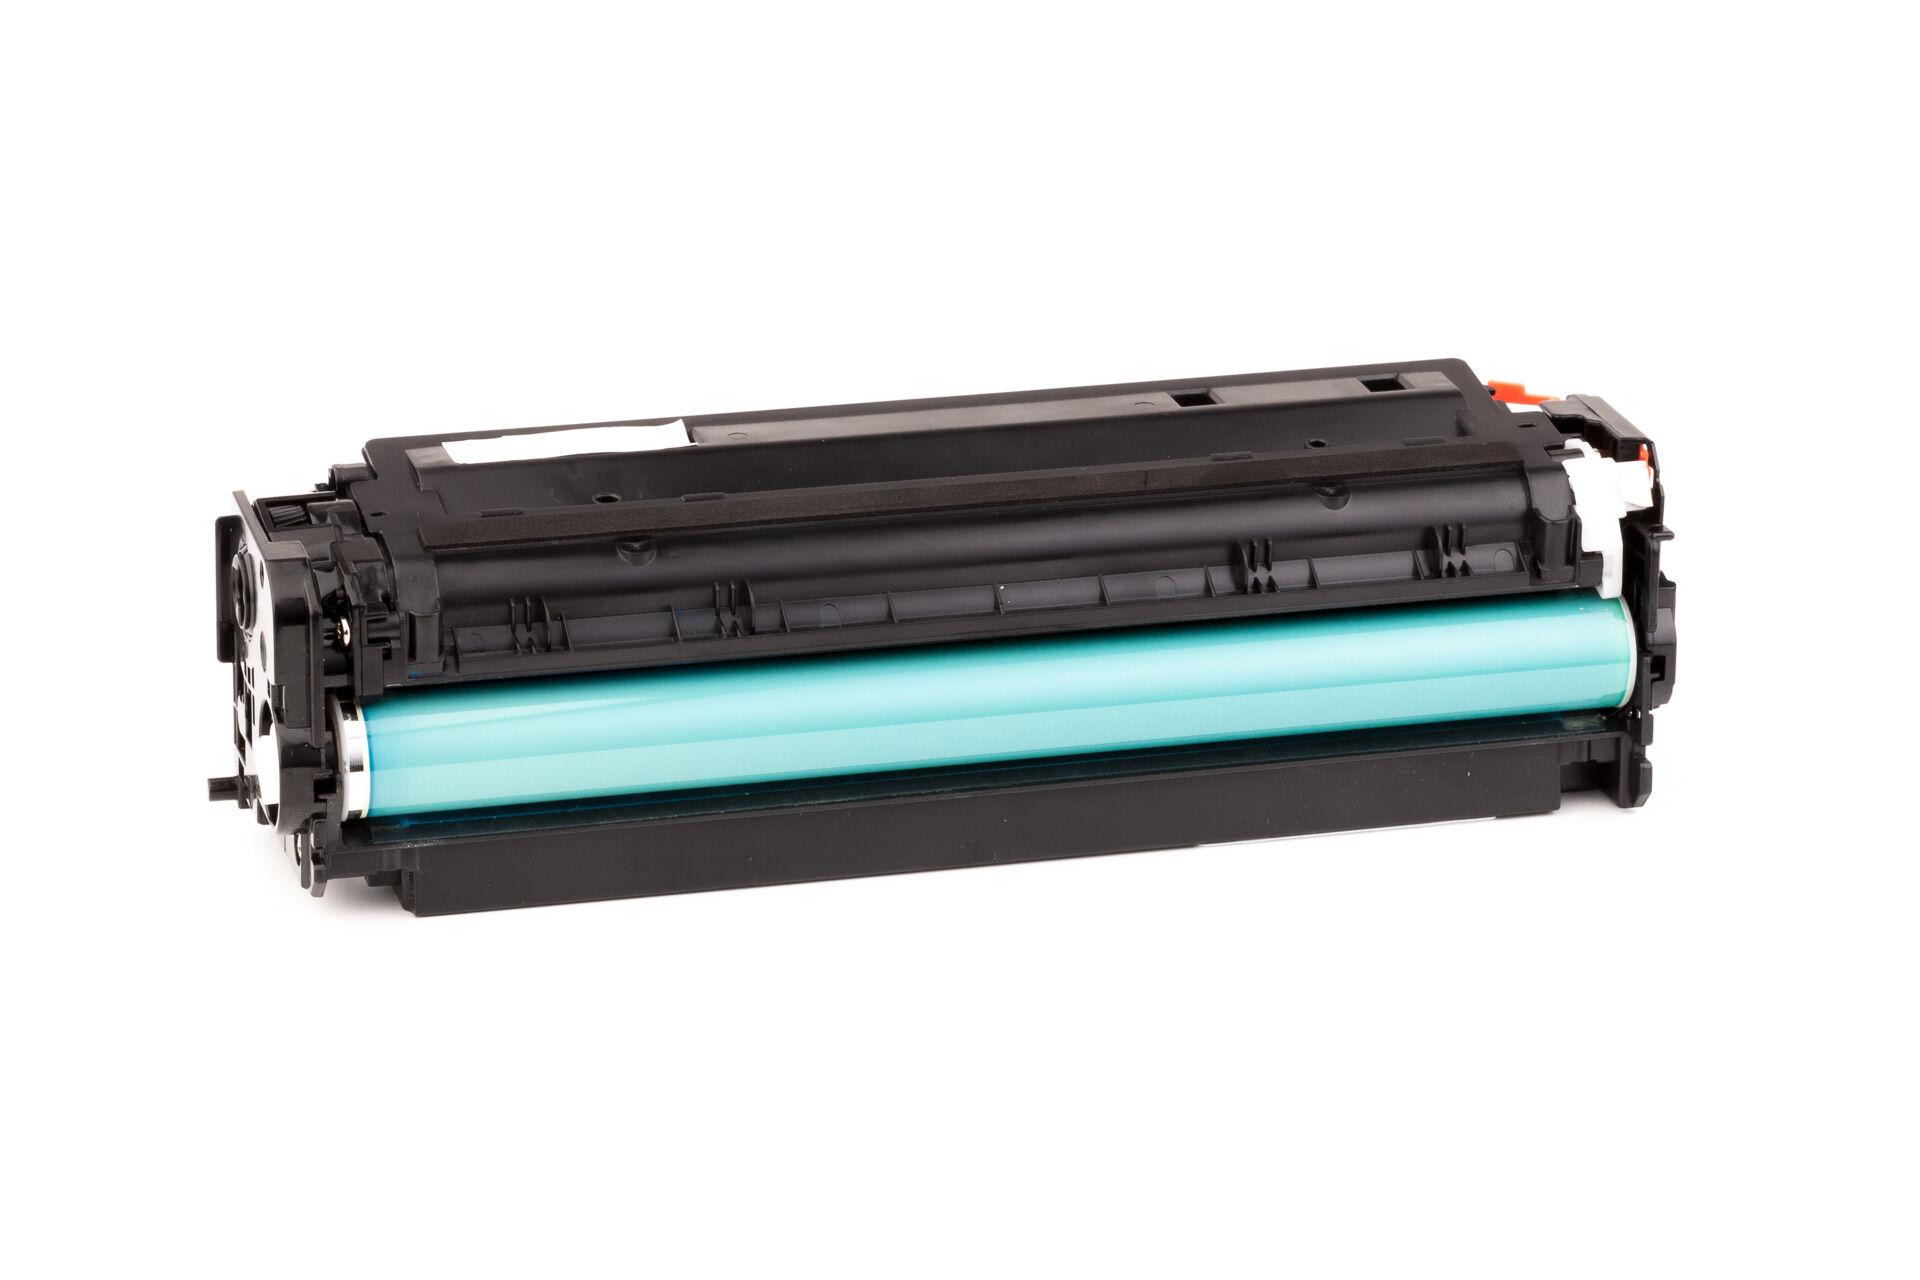 HP Cartouche de Toner pour HP CF381A / 312A cyan compatible (de marque ASC)